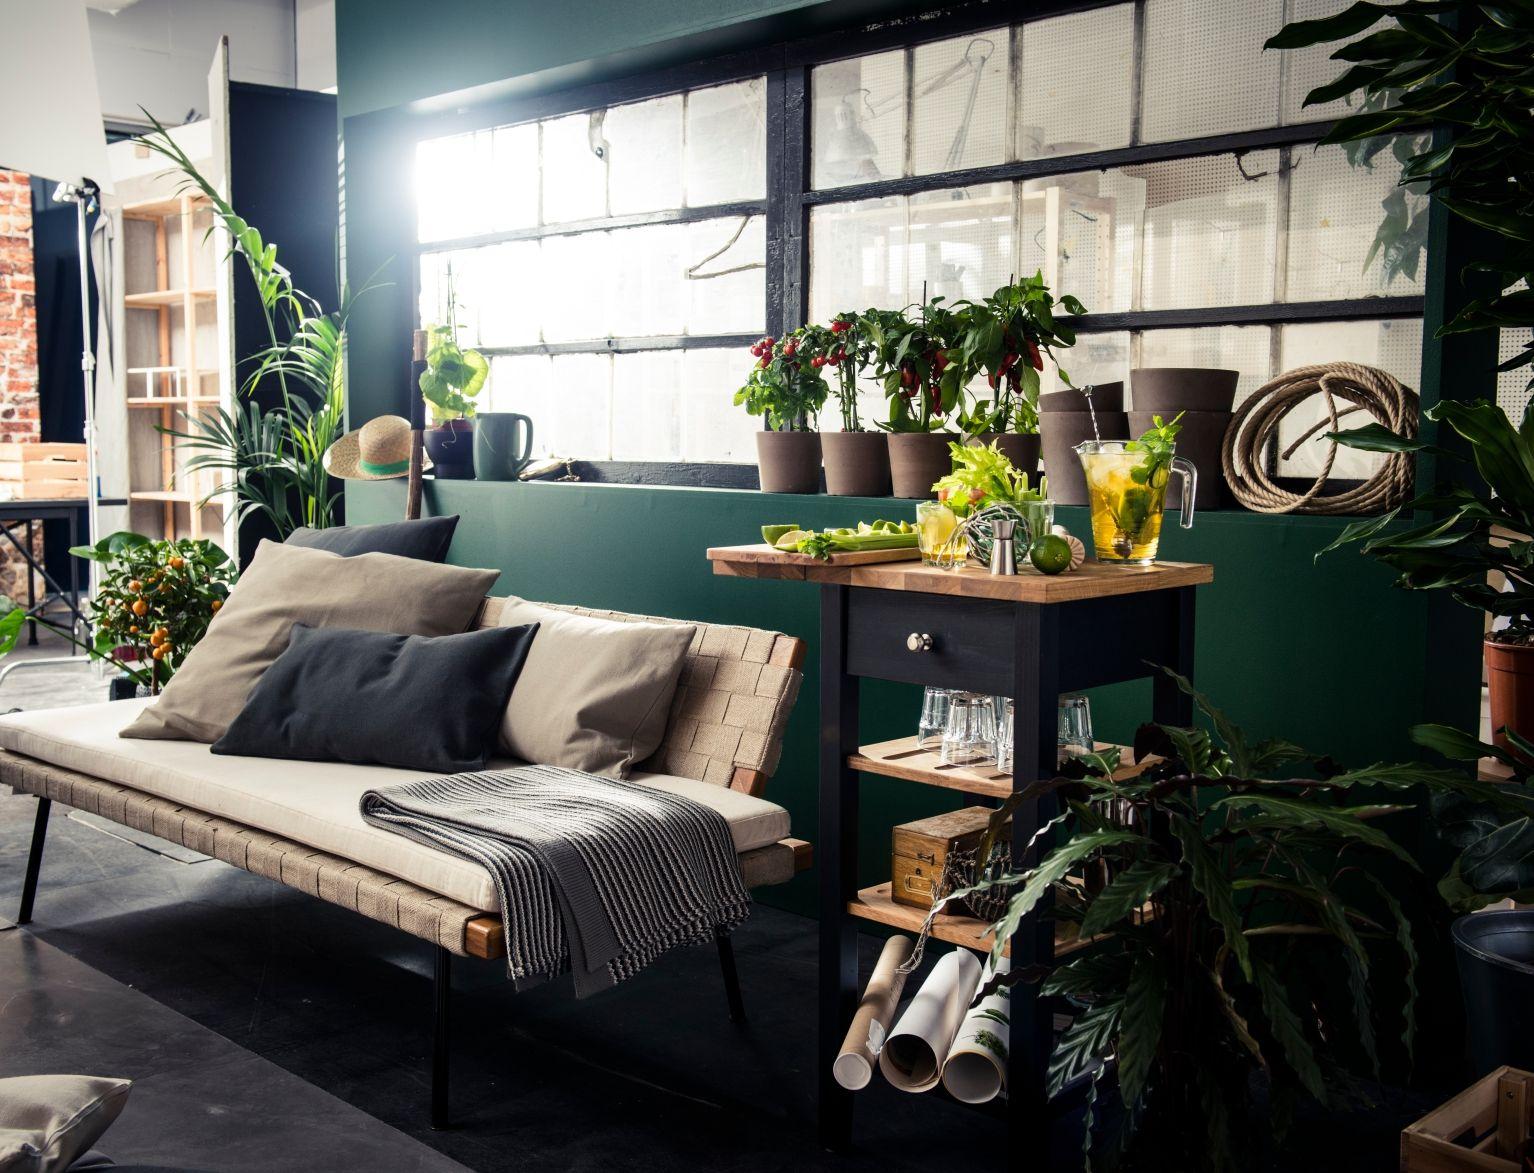 henriksdal stoelovertrek nolhaga lichtbeige producten catalogus en ontwerp. Black Bedroom Furniture Sets. Home Design Ideas